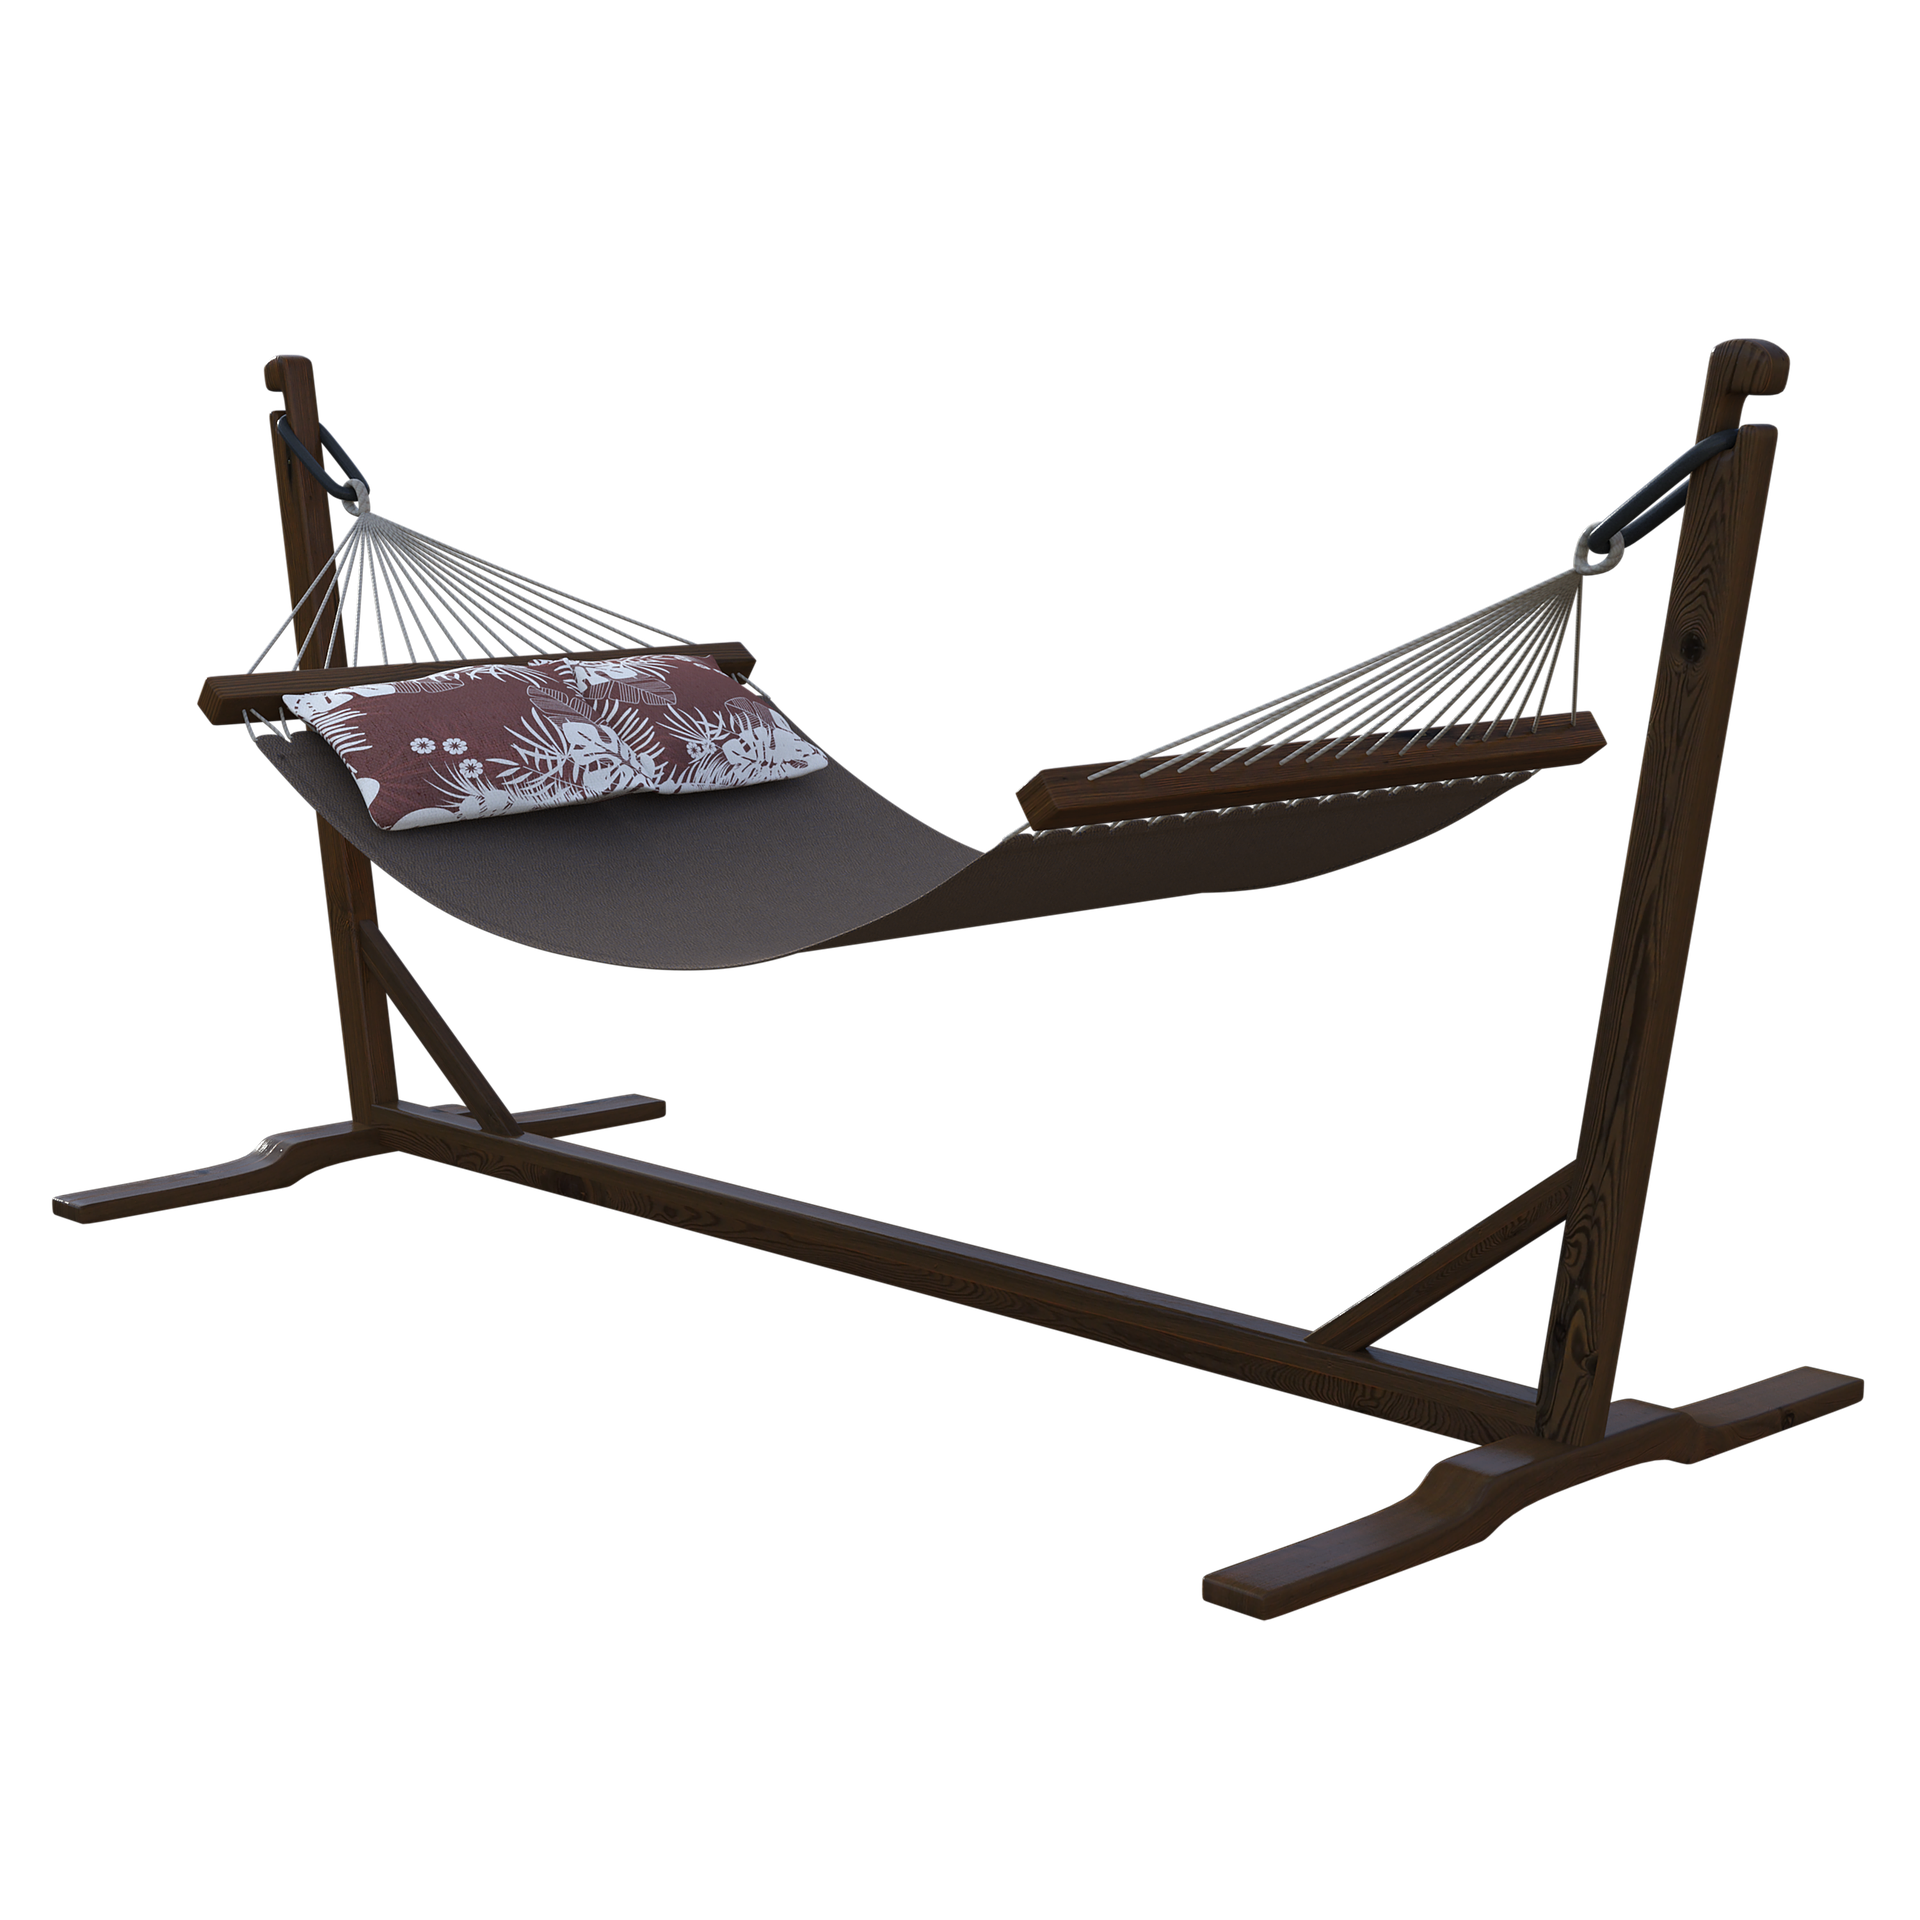 hammock-3953993_1920.png